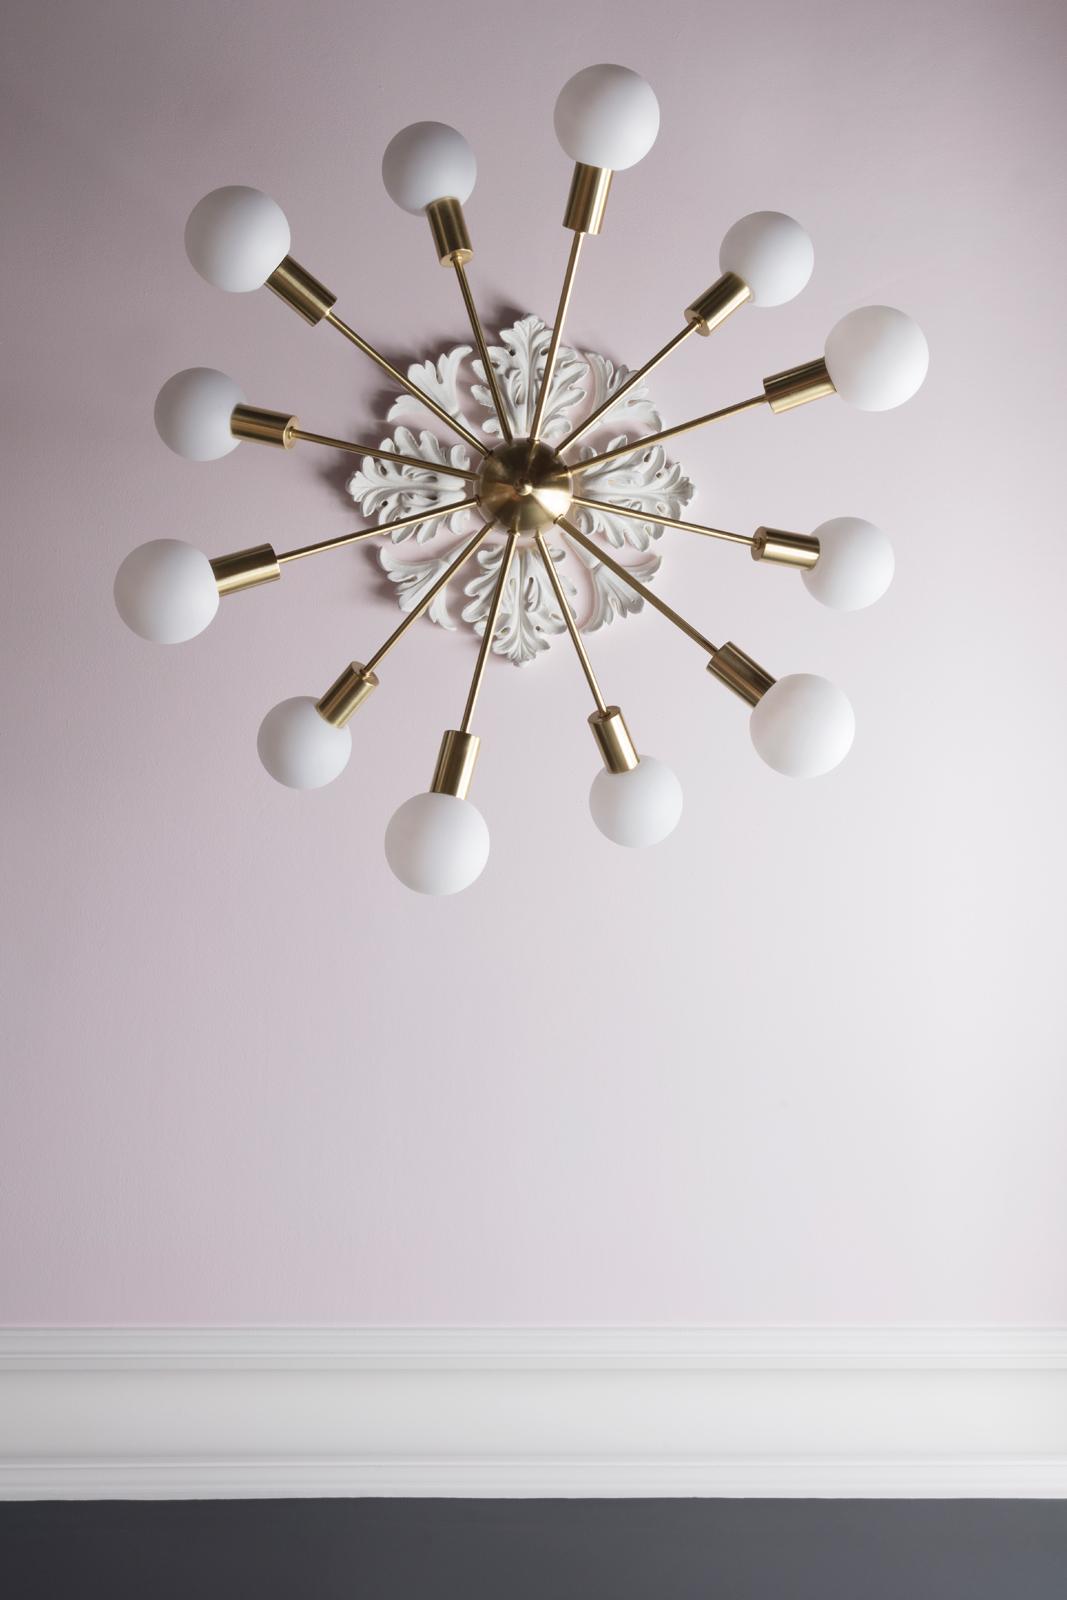 AFTER! Dexter sputnik light from Marks & Spencer/Photo: Susie Lowe